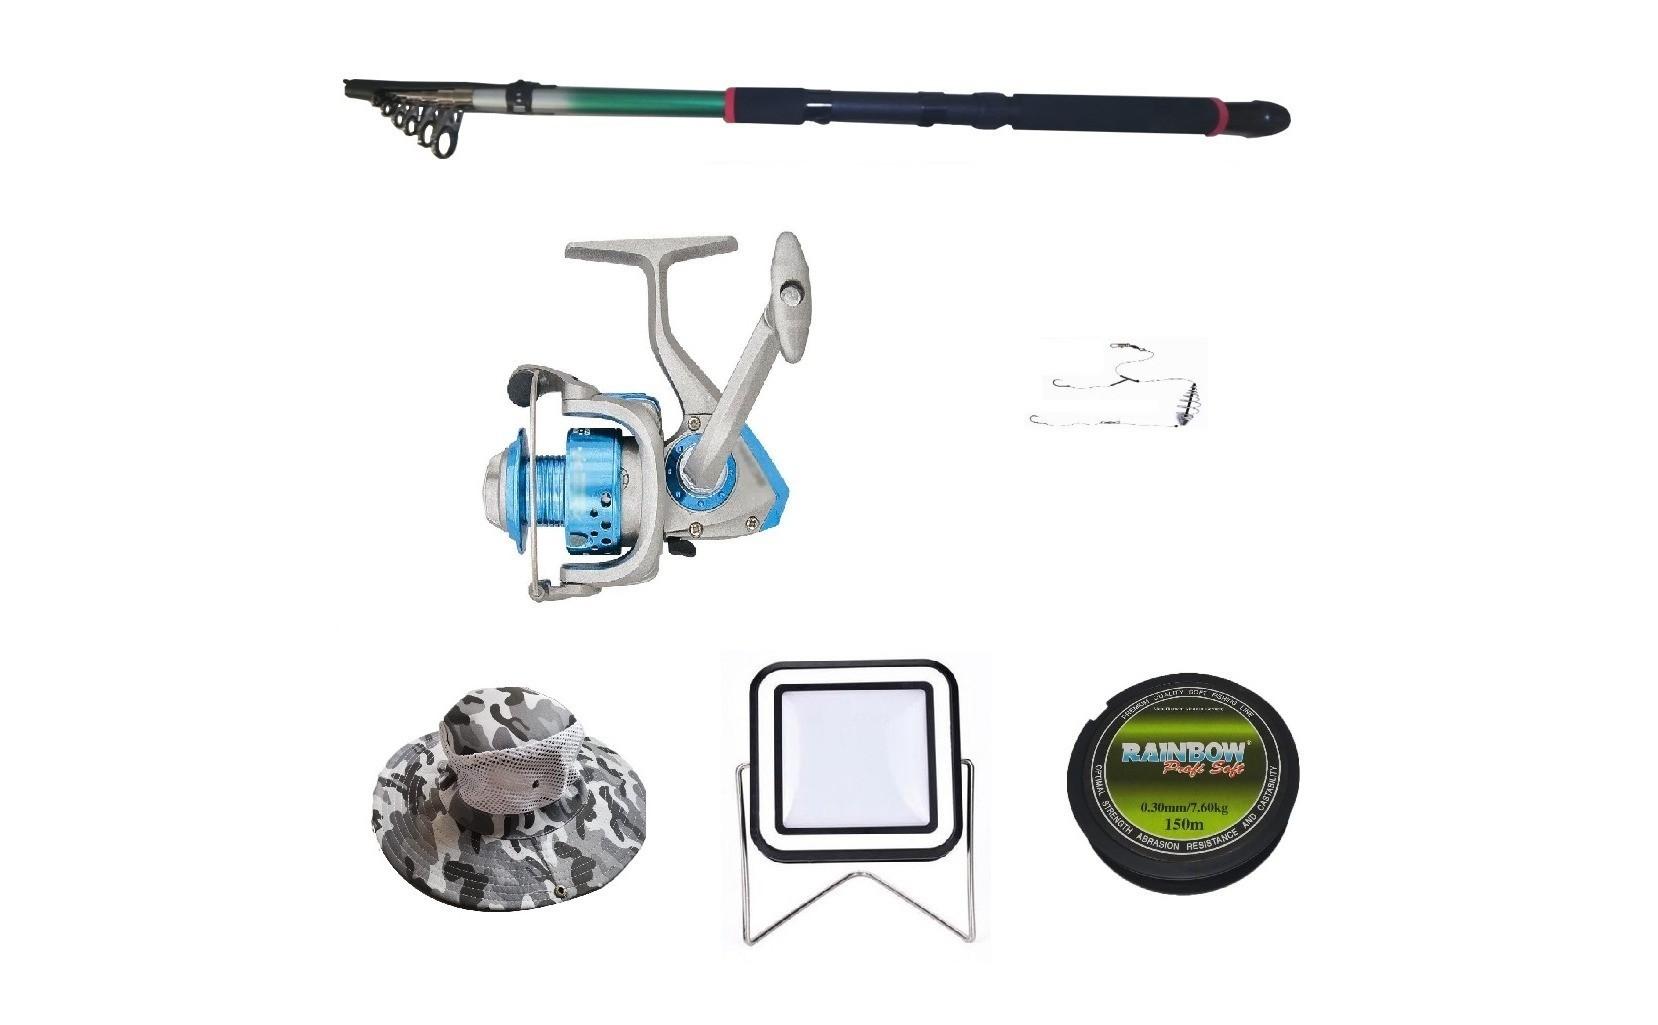 Set lanseta 3.6m pescuit sportiv, mulineta DB5000, fir, montura, proiector solar si palarie imagine techstar.ro 2021